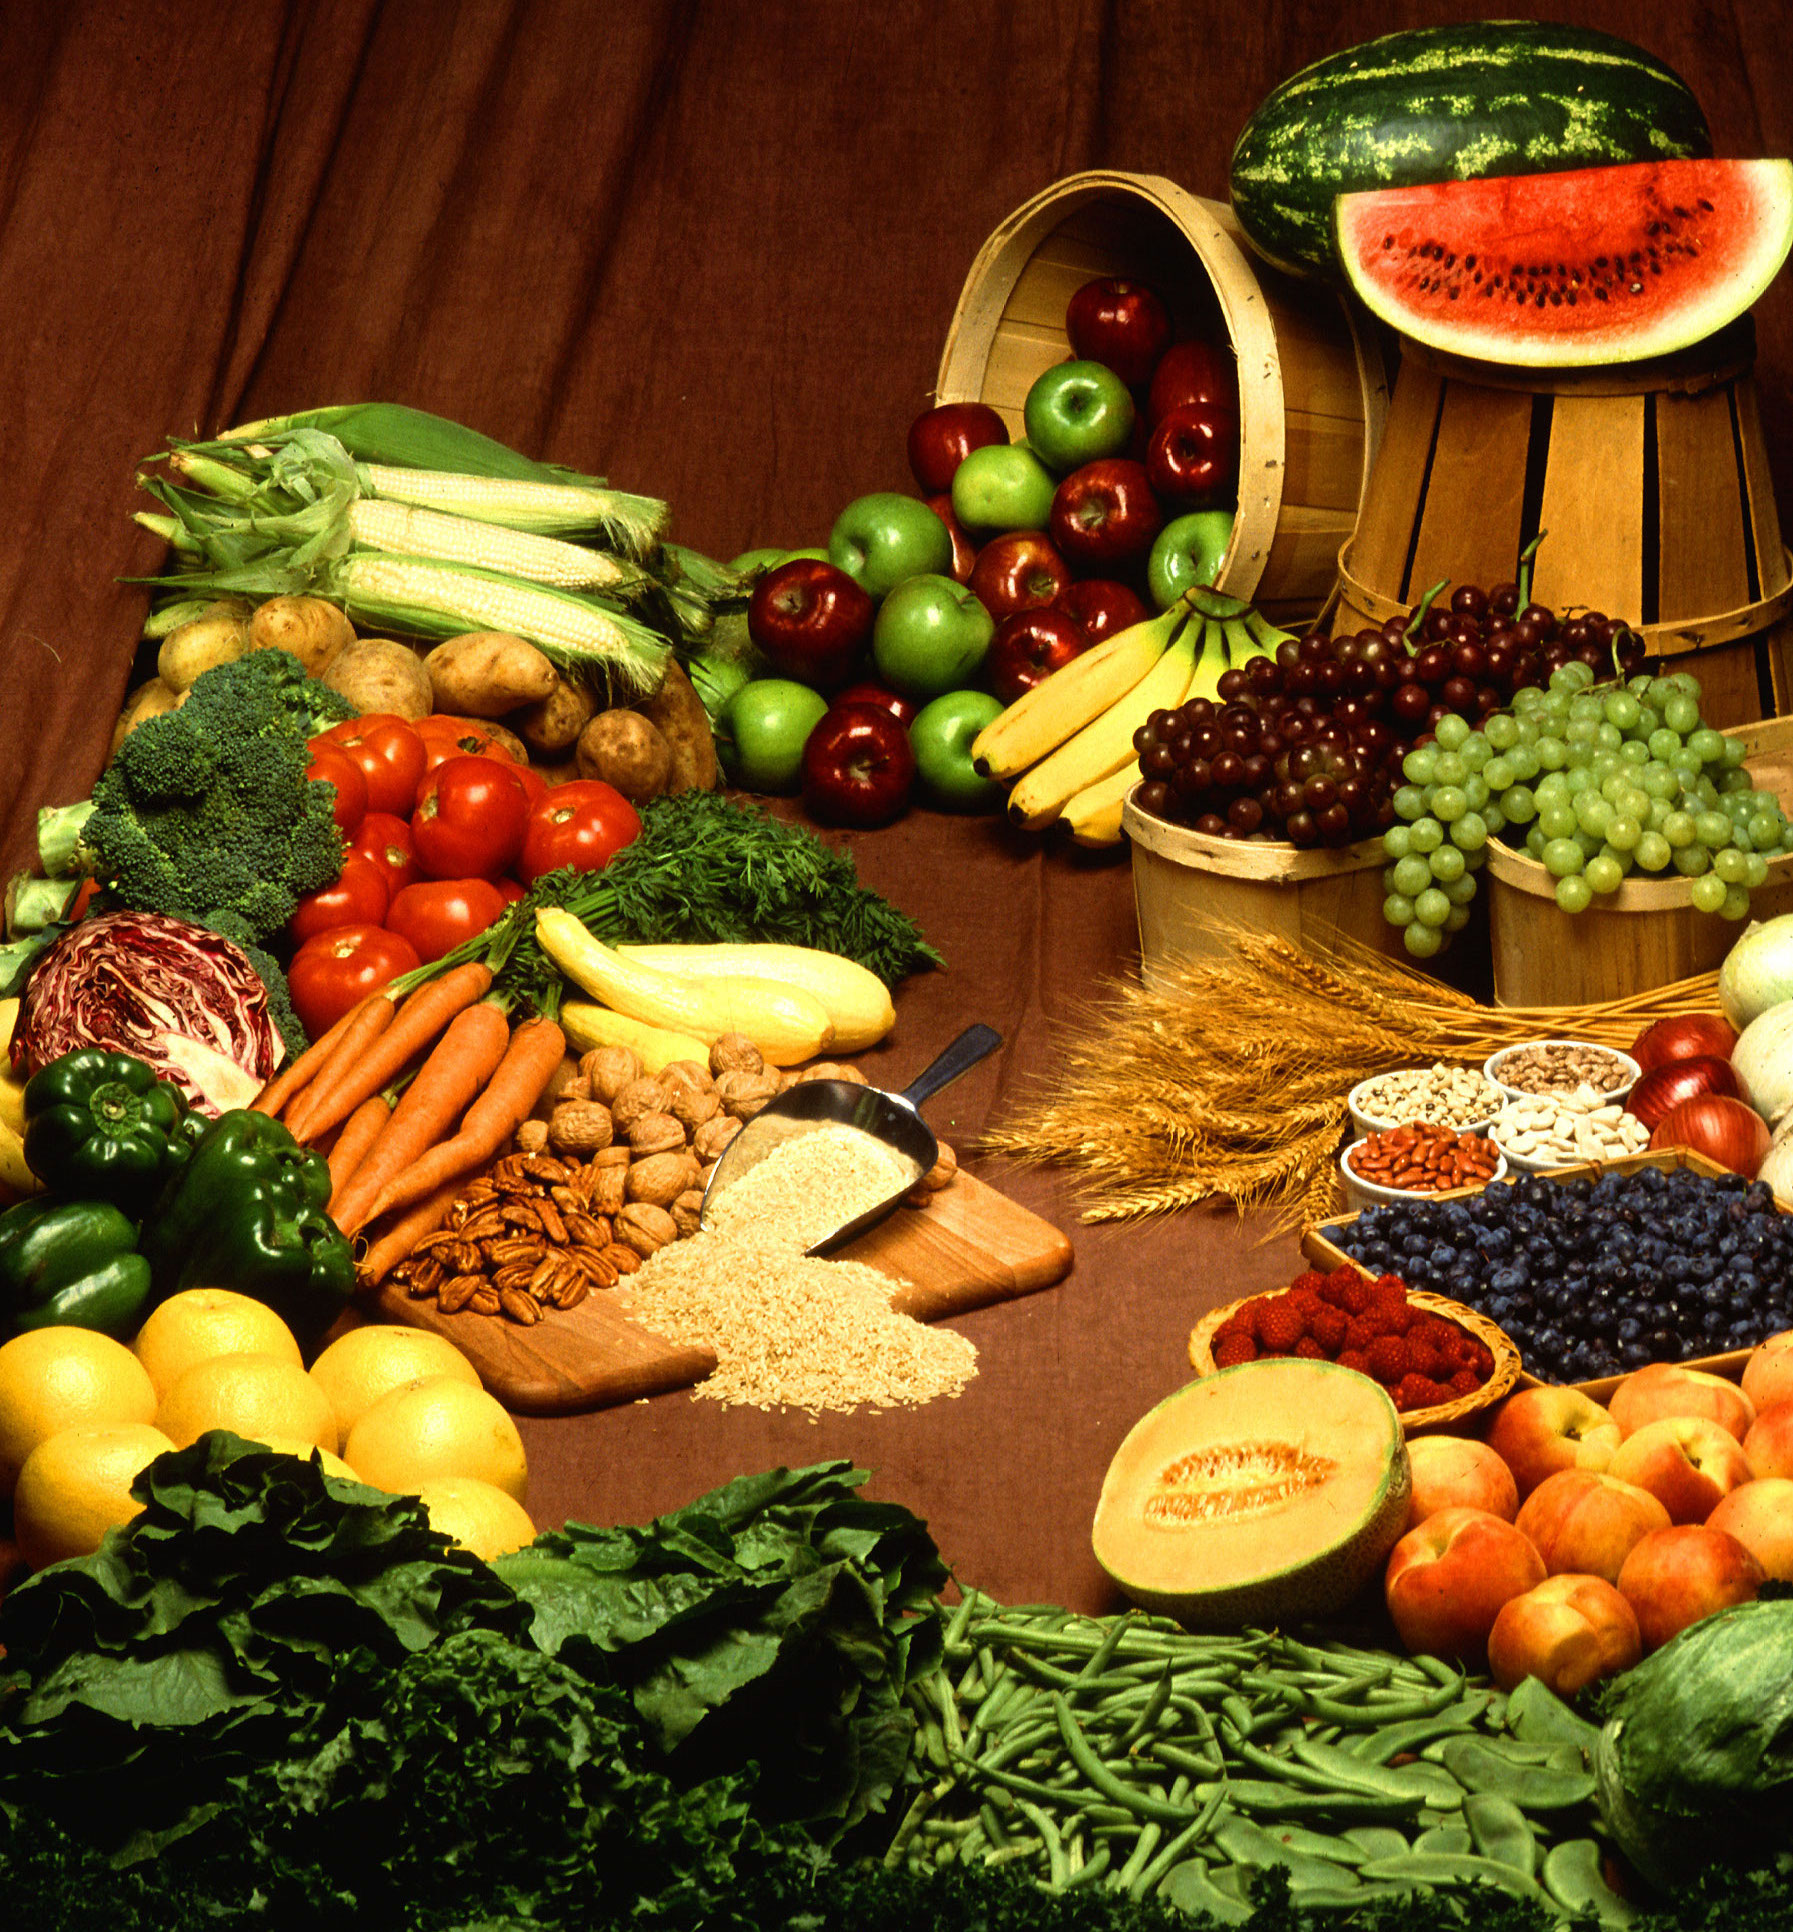 Nutritional Food Photo